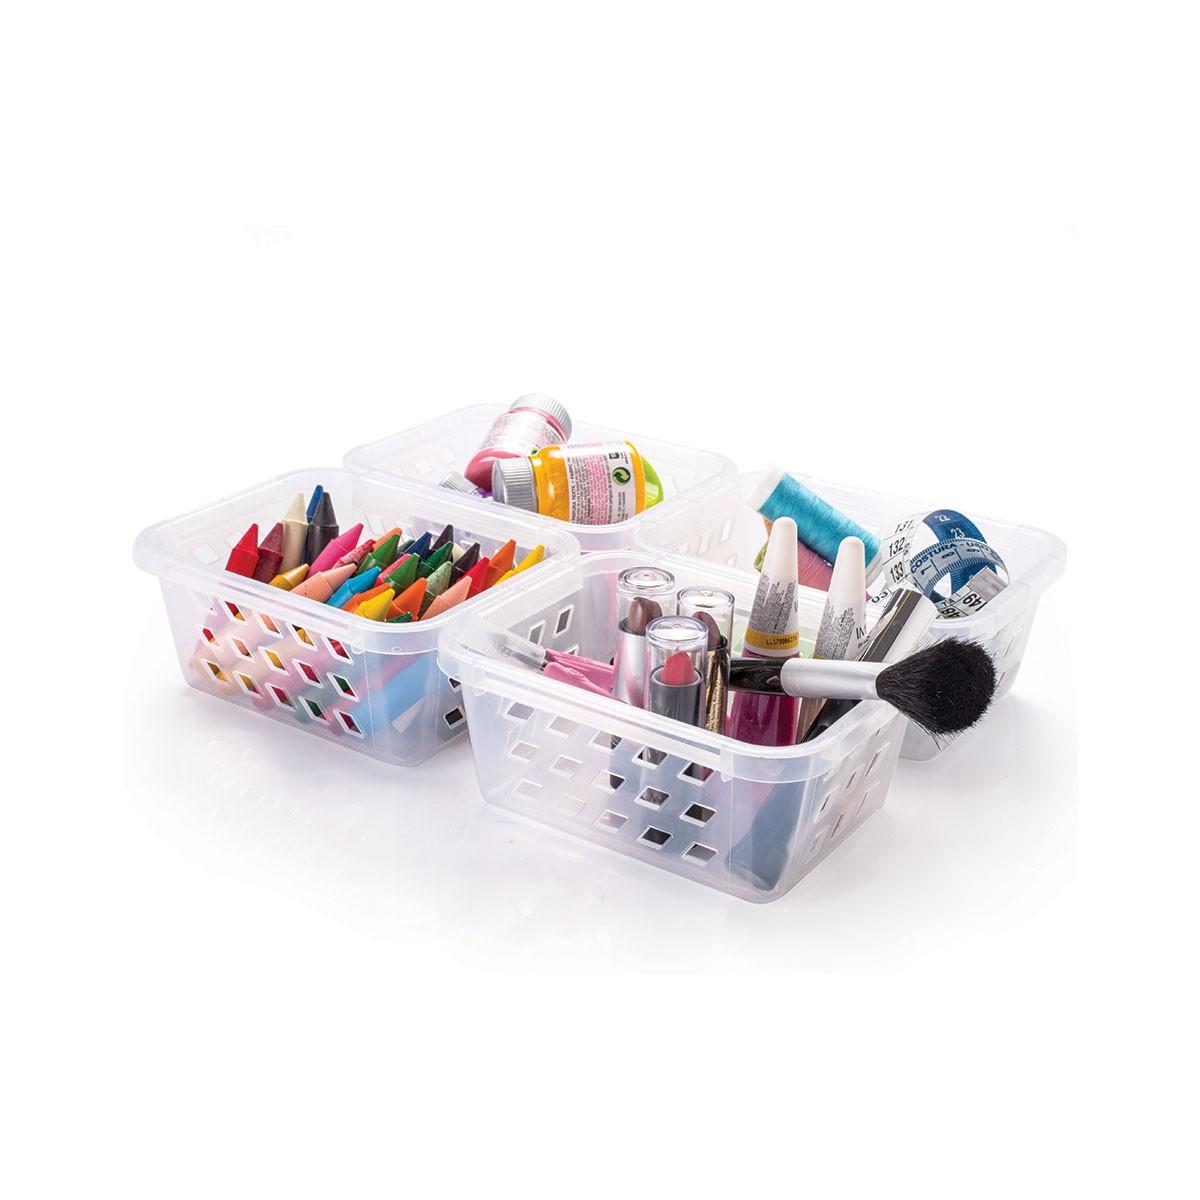 Cesto Organizador Plástico Pequeno Kit 6 pçs